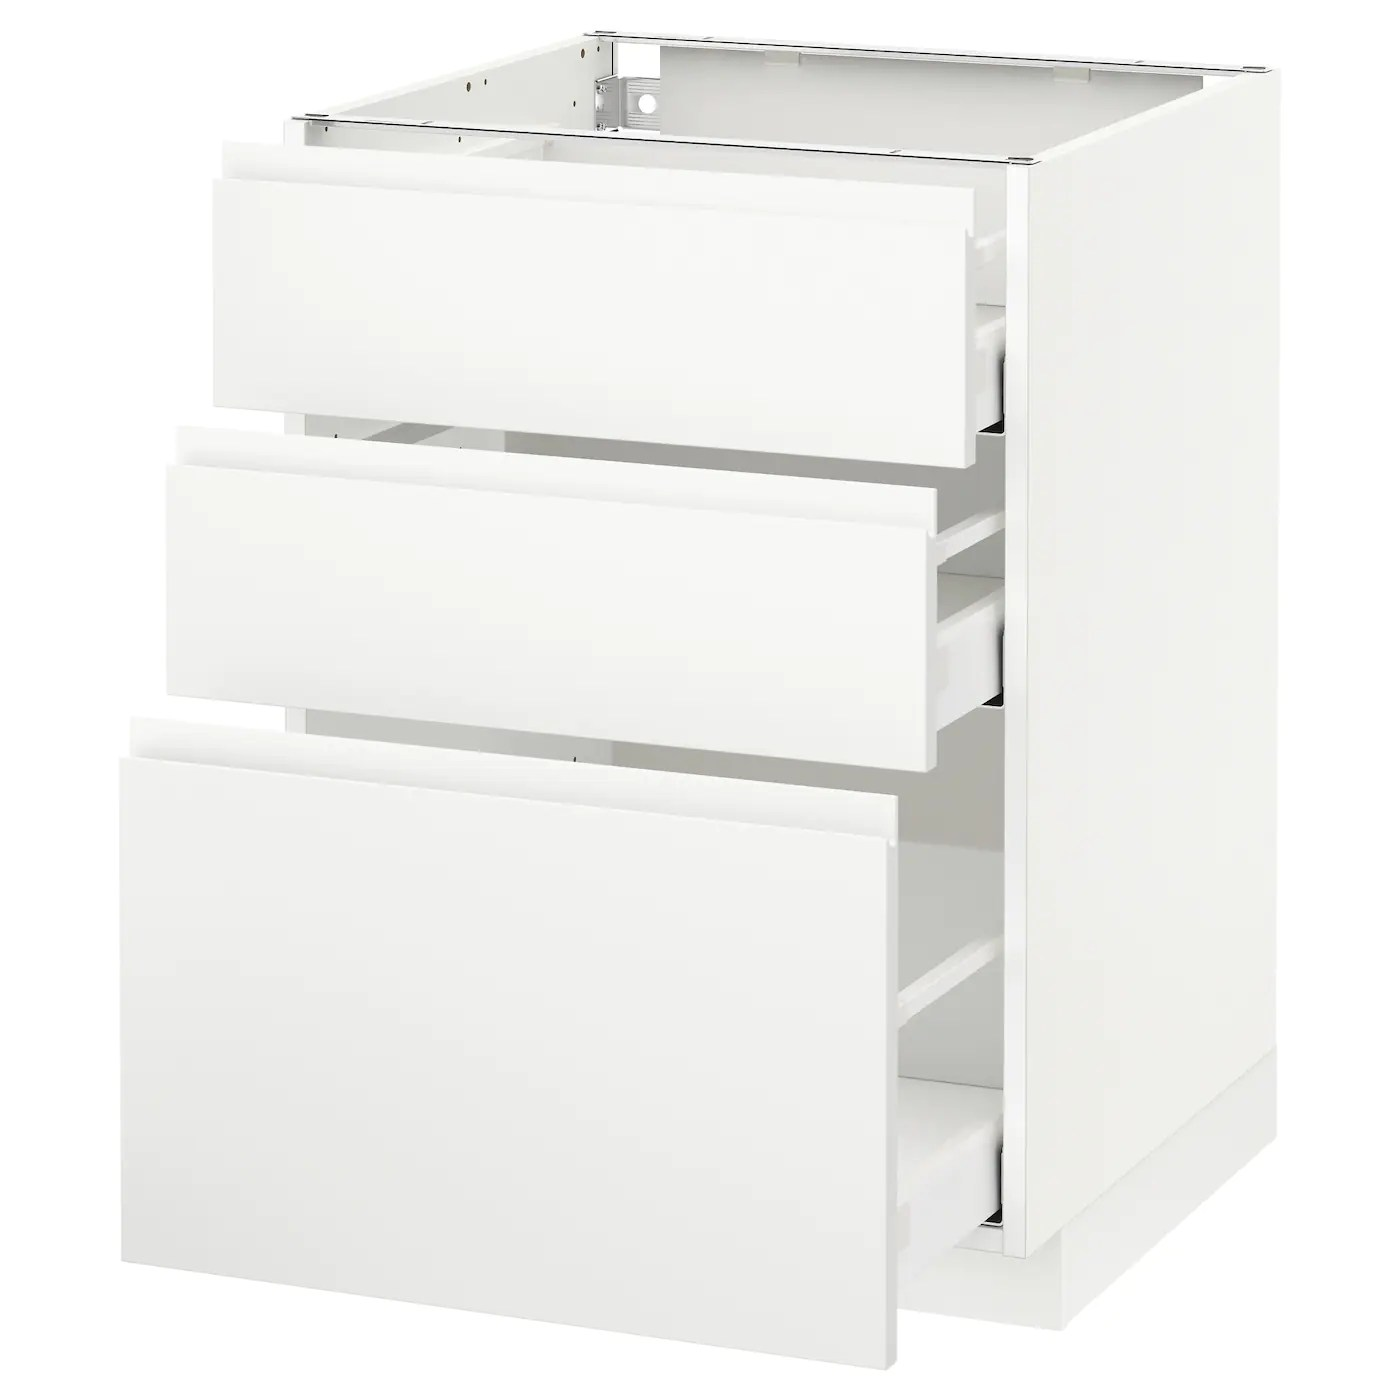 Ikea Metod Maximera | Mobile Lavello Cucina Ikea 5 Metod Pensile Con ...